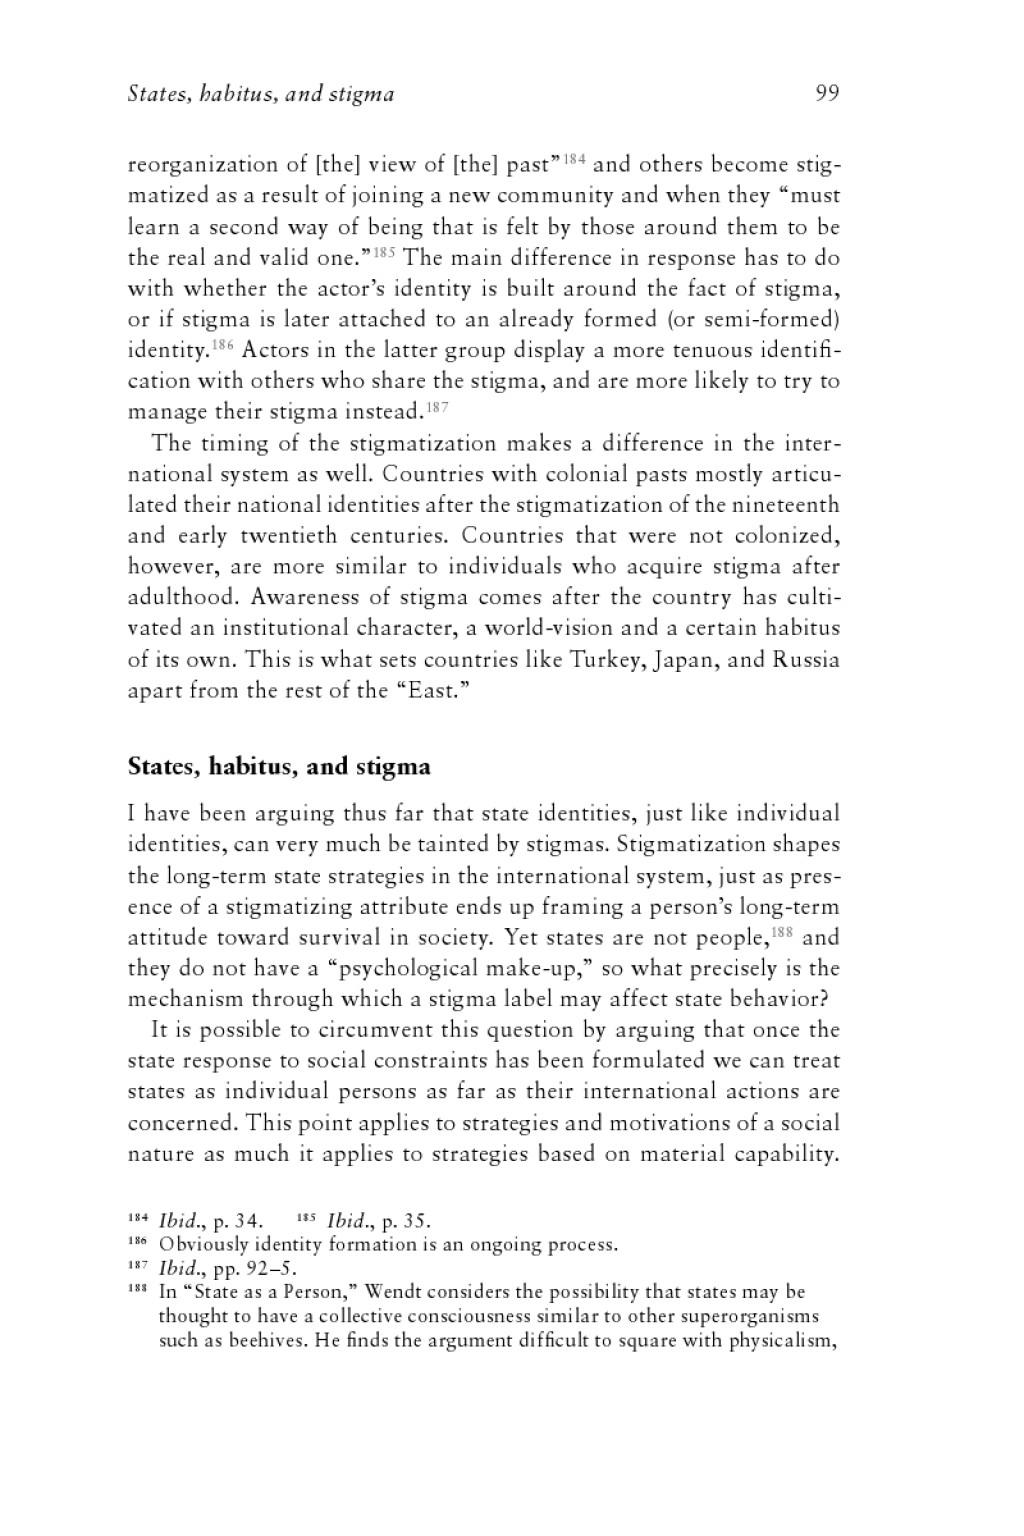 012 Zarakol National Honor Society Application Essay Sensational Junior Ideas Examples Large